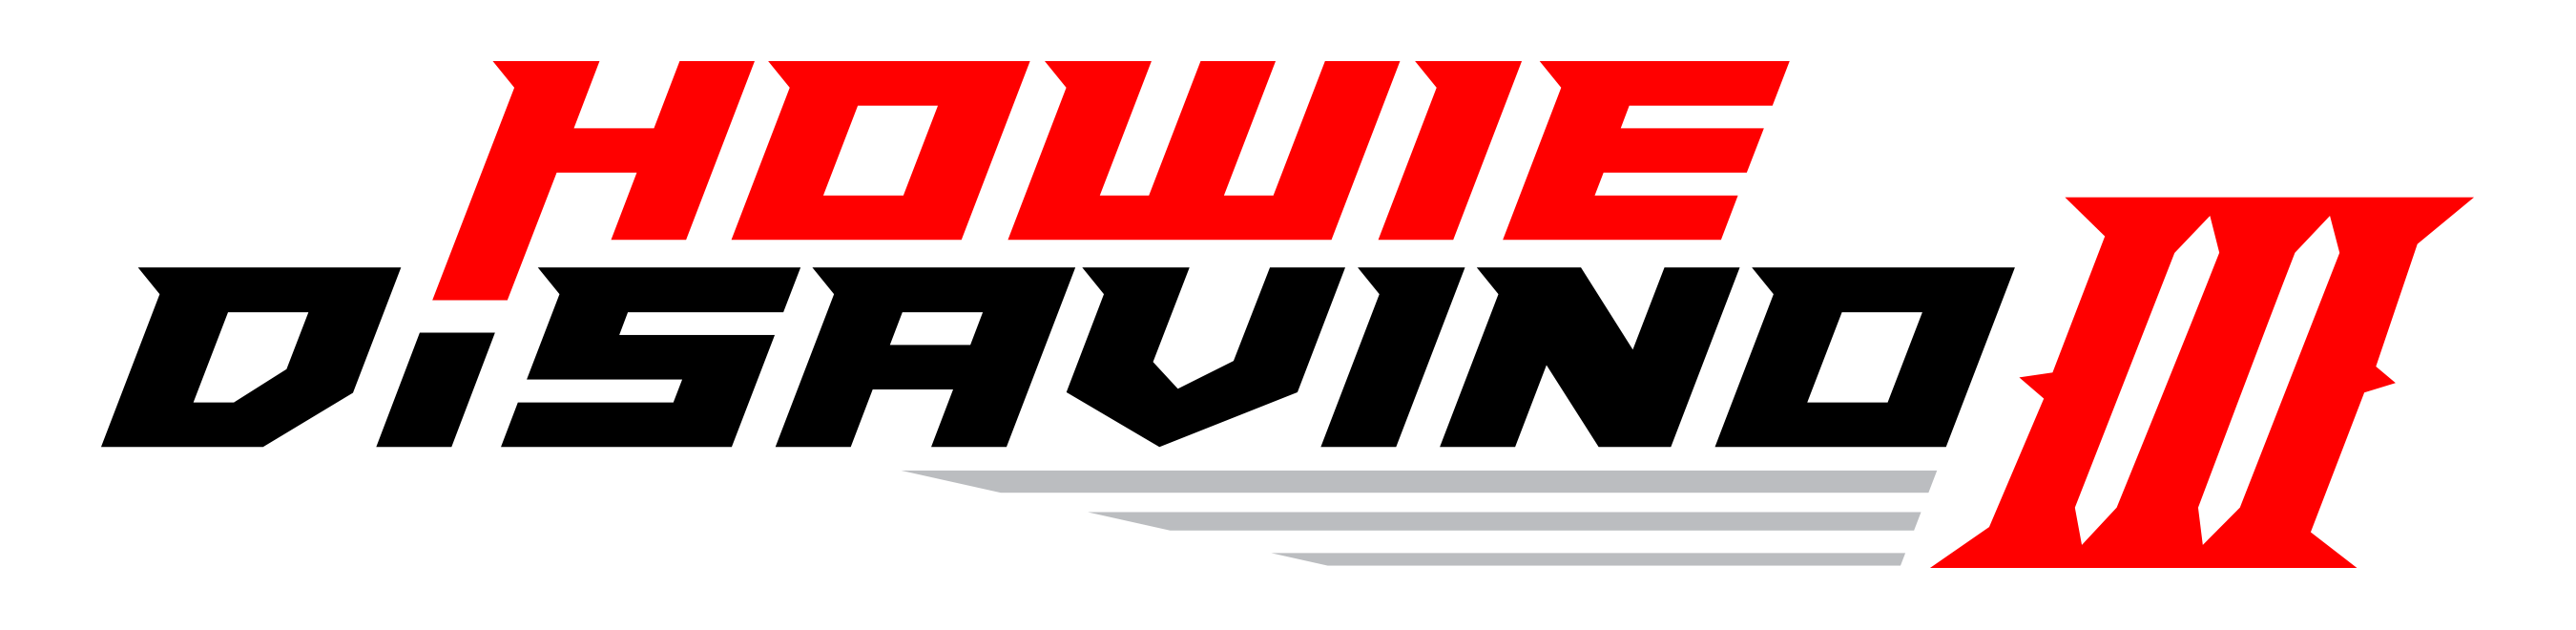 HD3 Racing // Howie DiSavino III